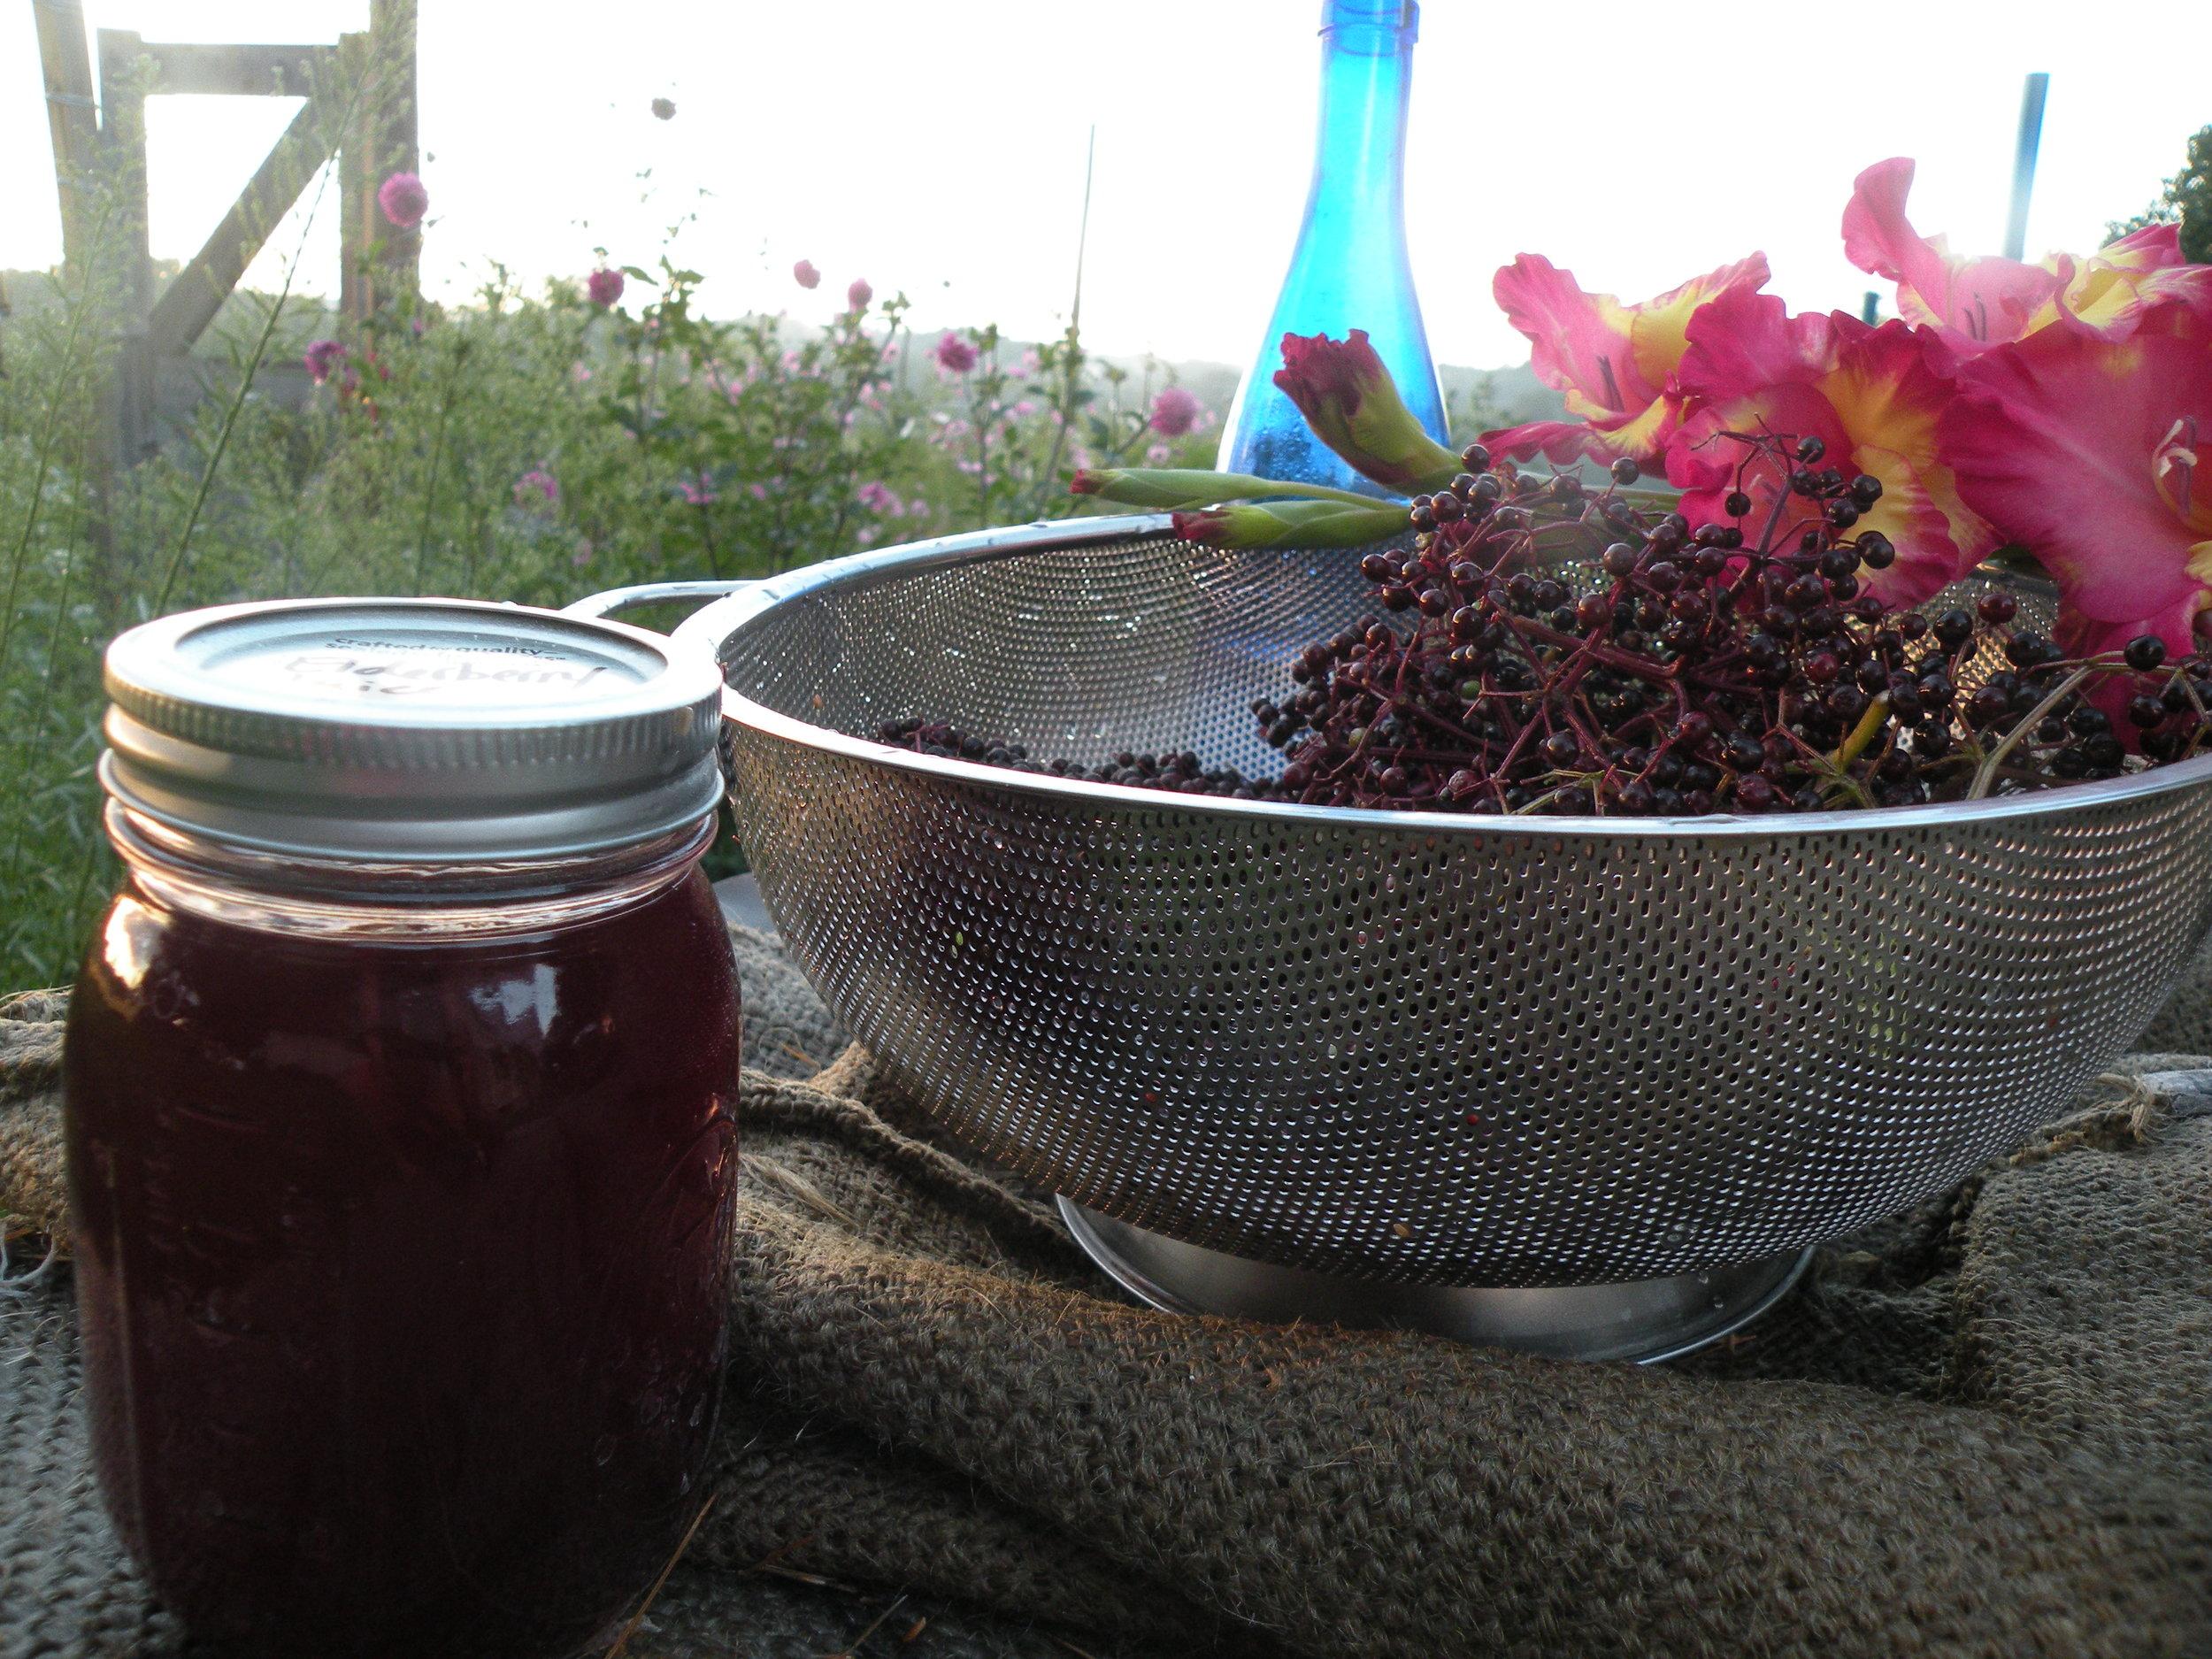 elderberry juice and berries - close up.jpg